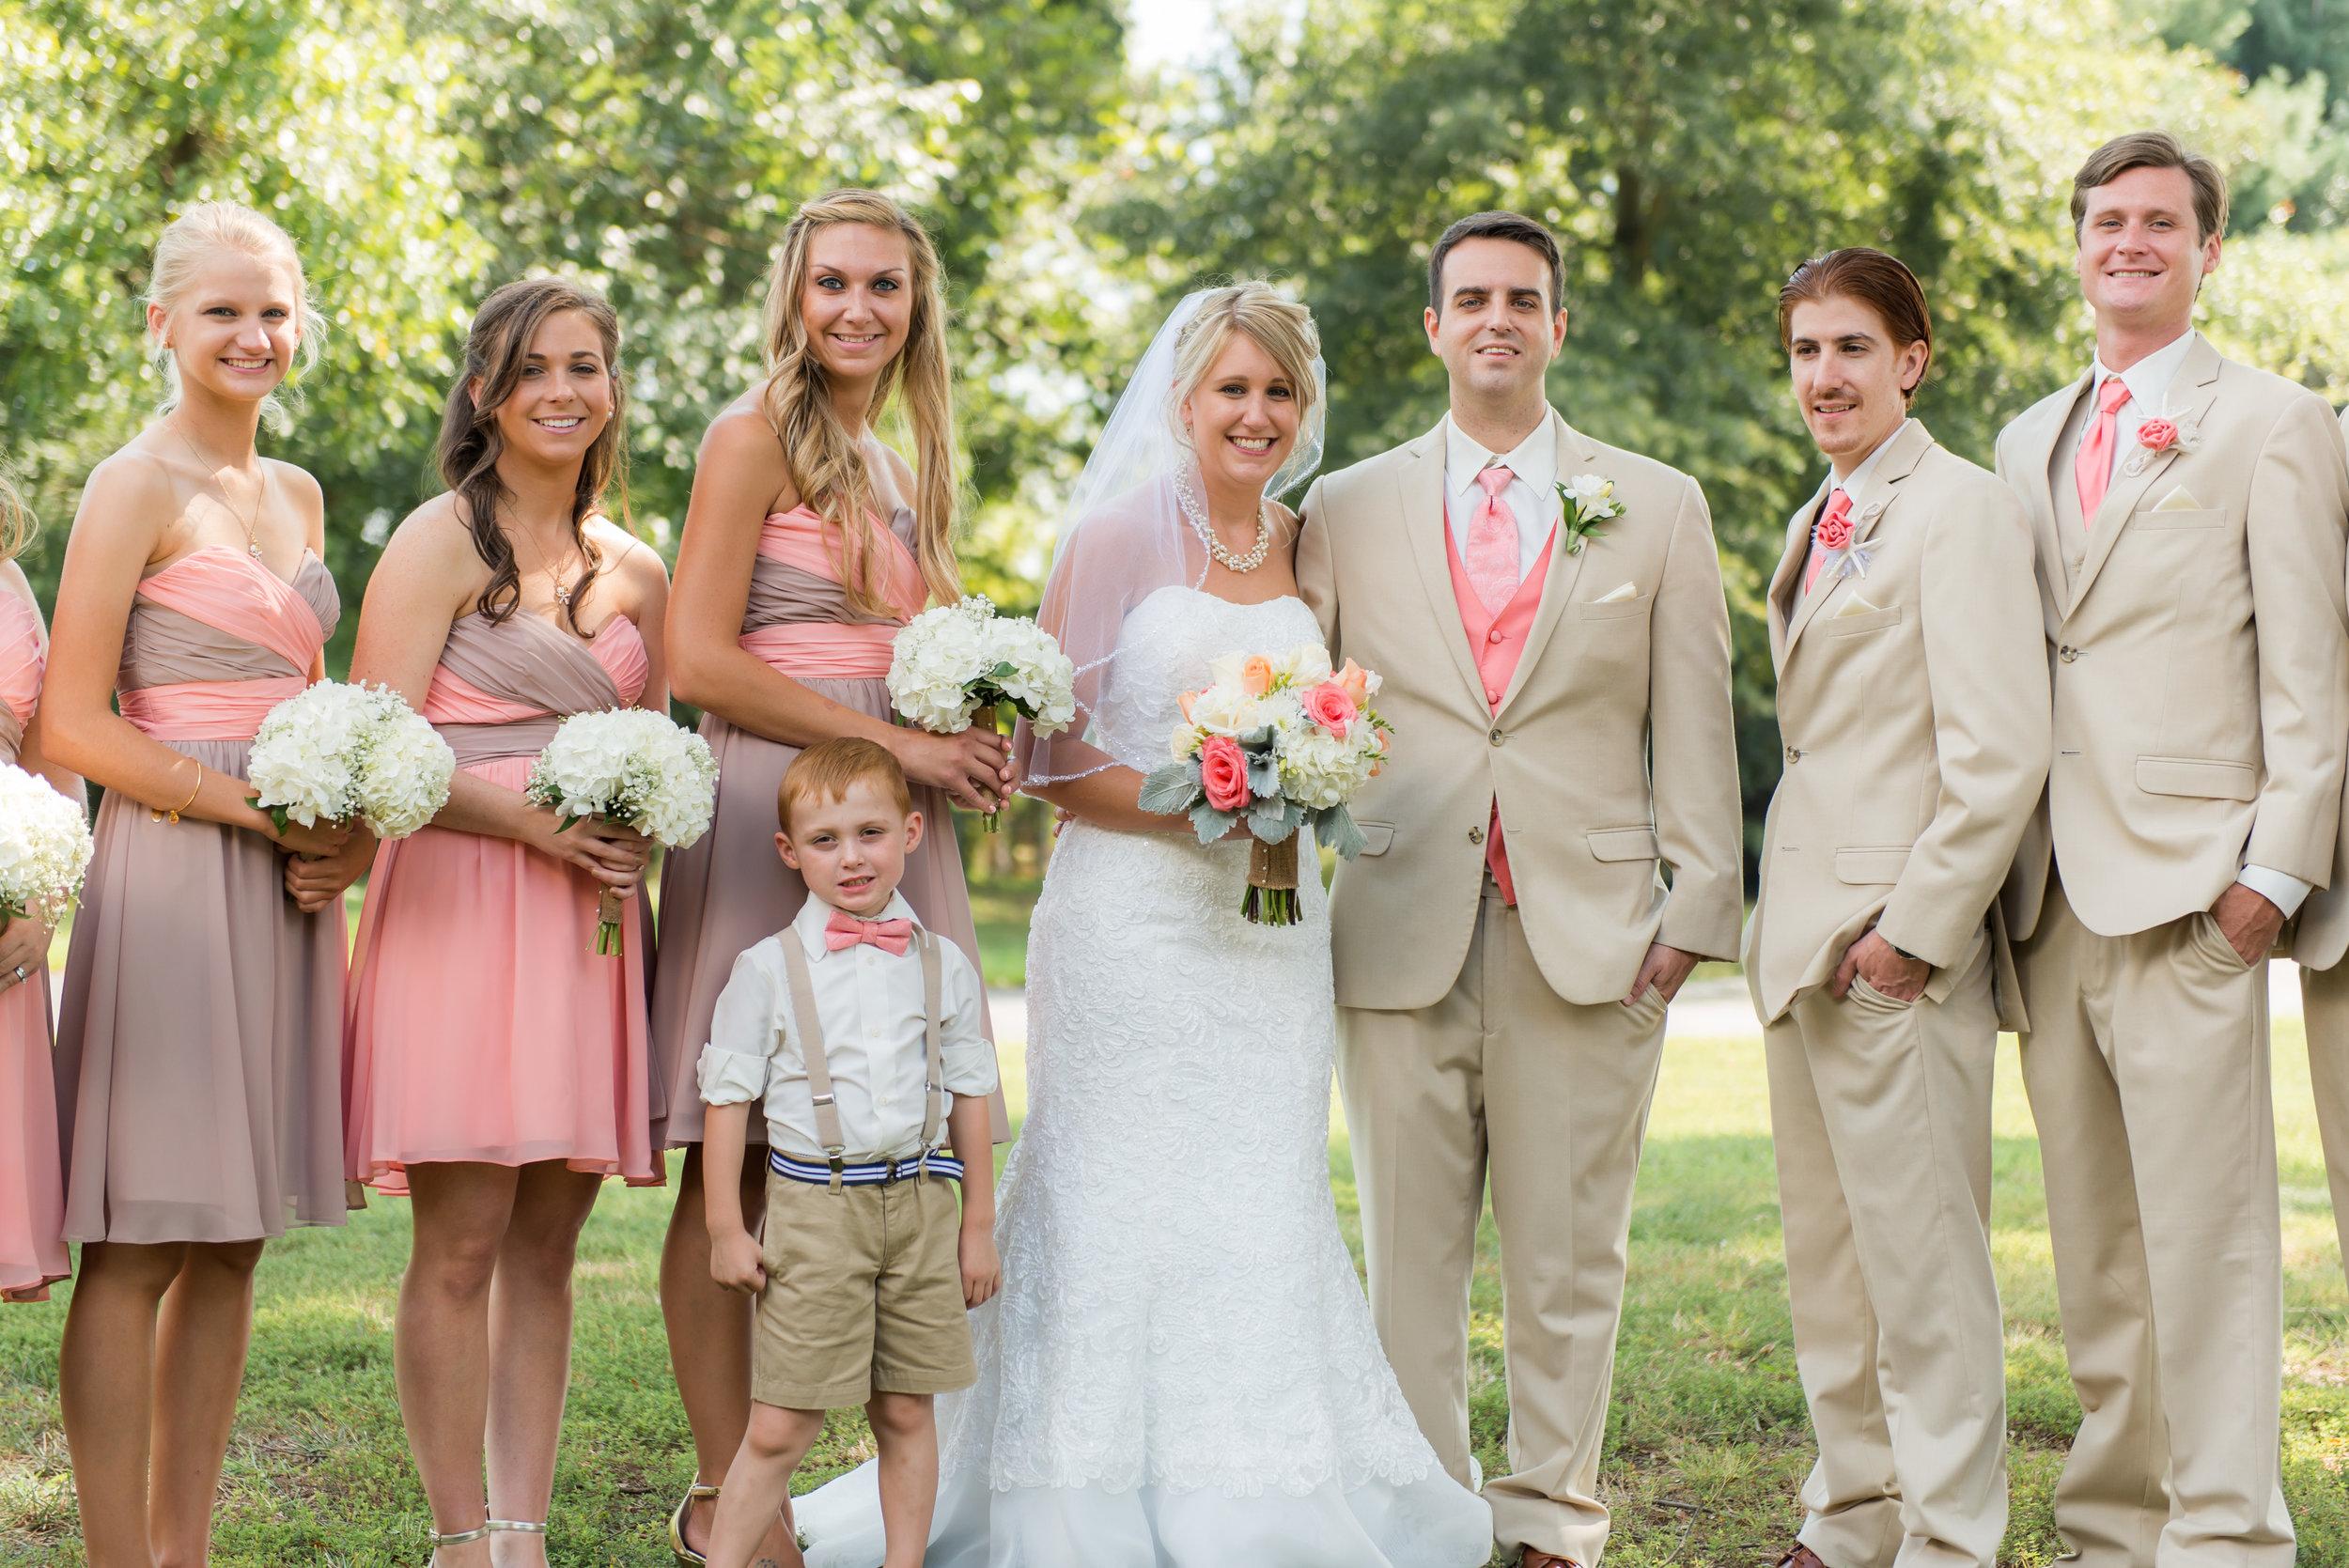 Justin + Amanda_Married299 copy.jpg